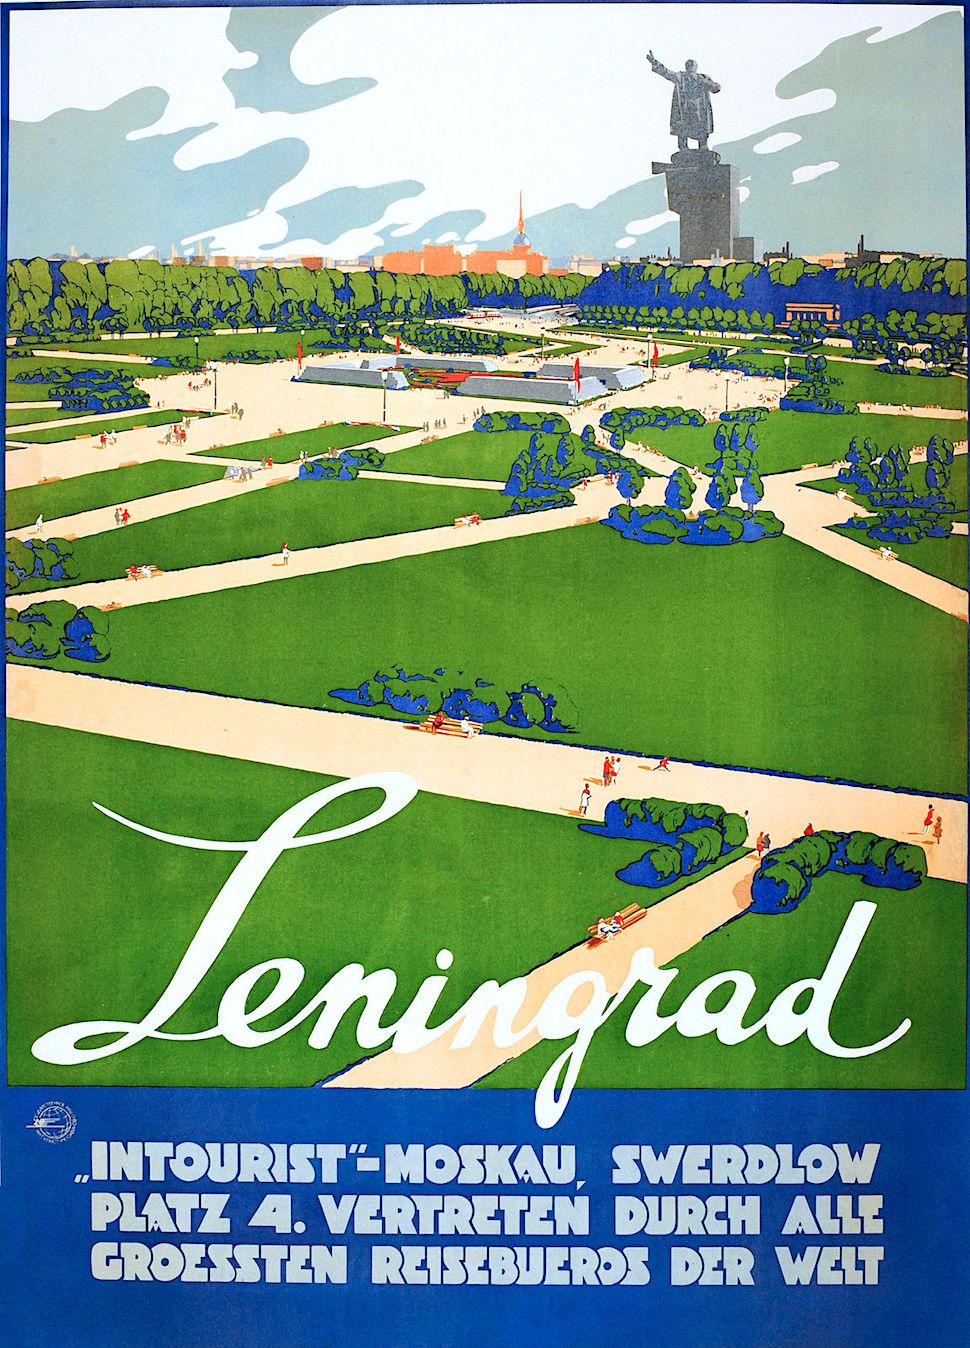 a 1930s German travel poster for Leningrad